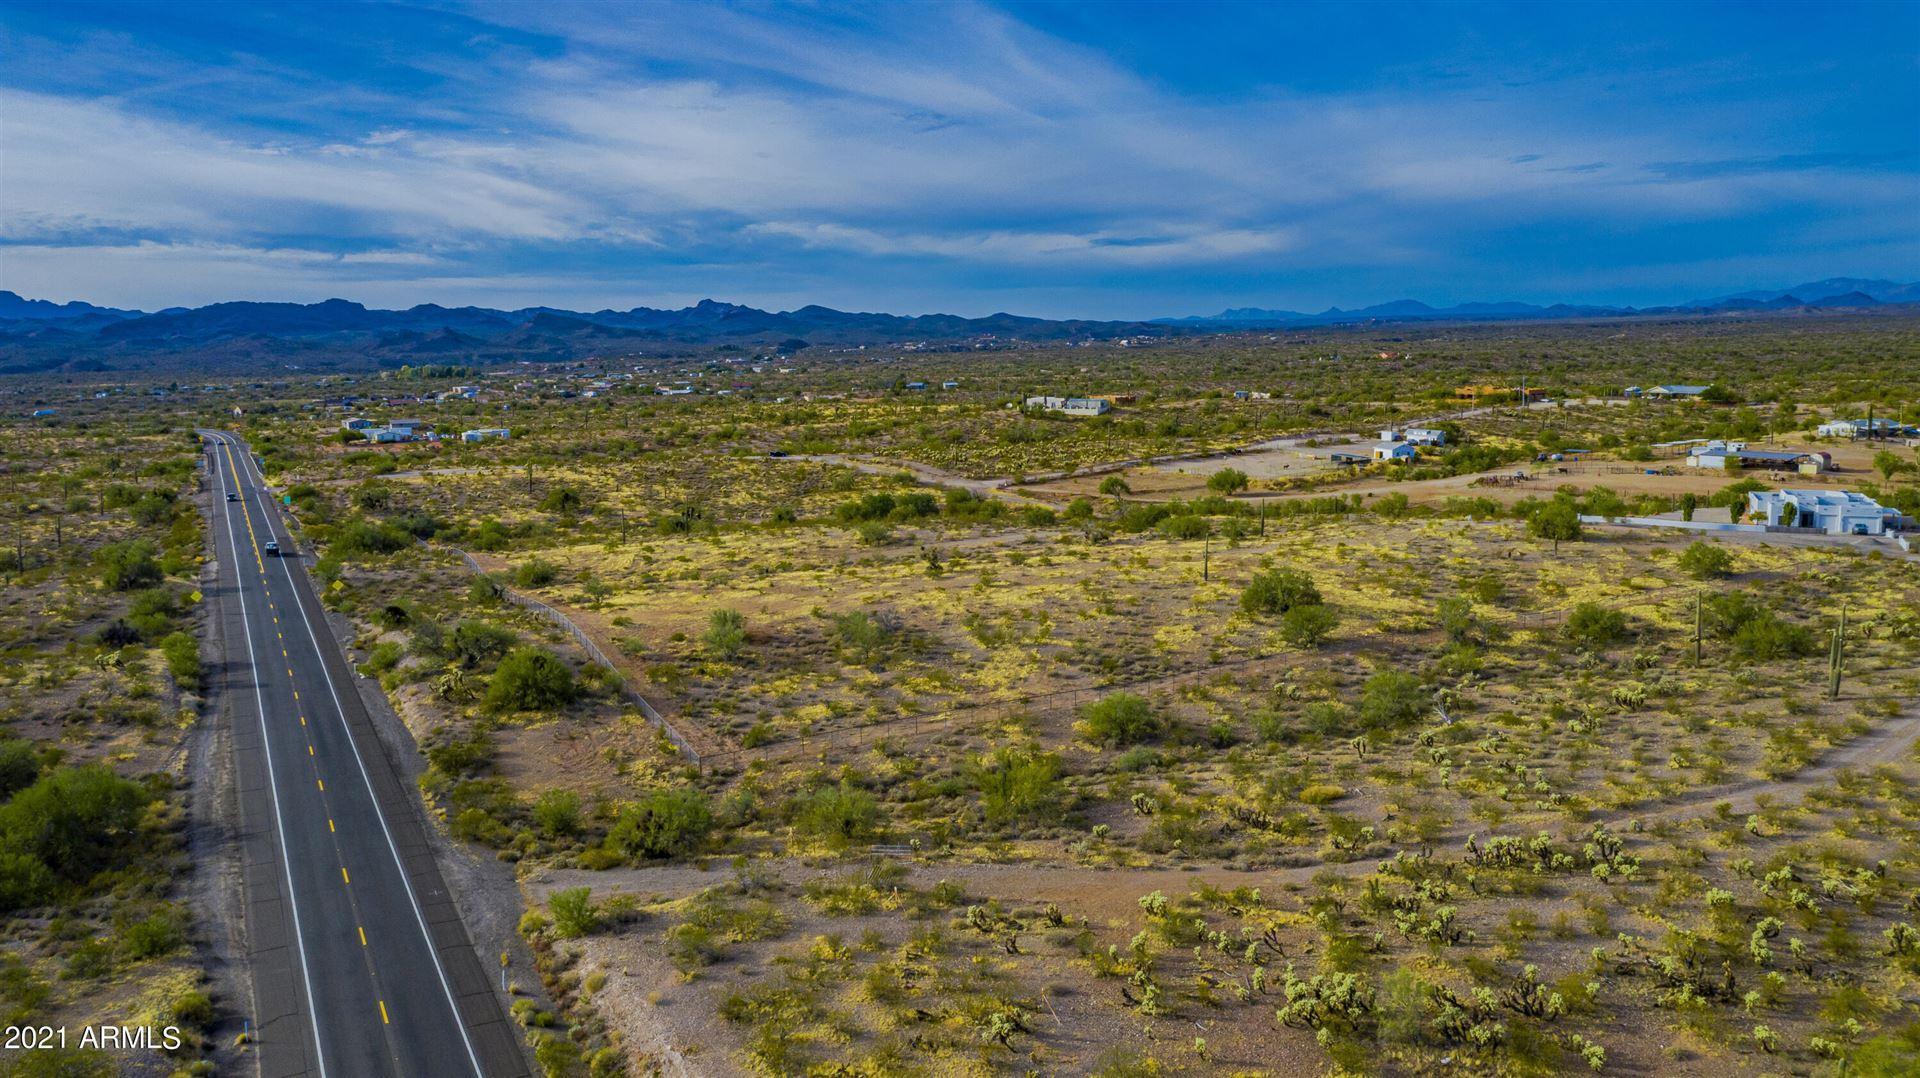 Photo of 40000 N 253rd lot 3 Road, Morristown, AZ 85342 (MLS # 6217589)